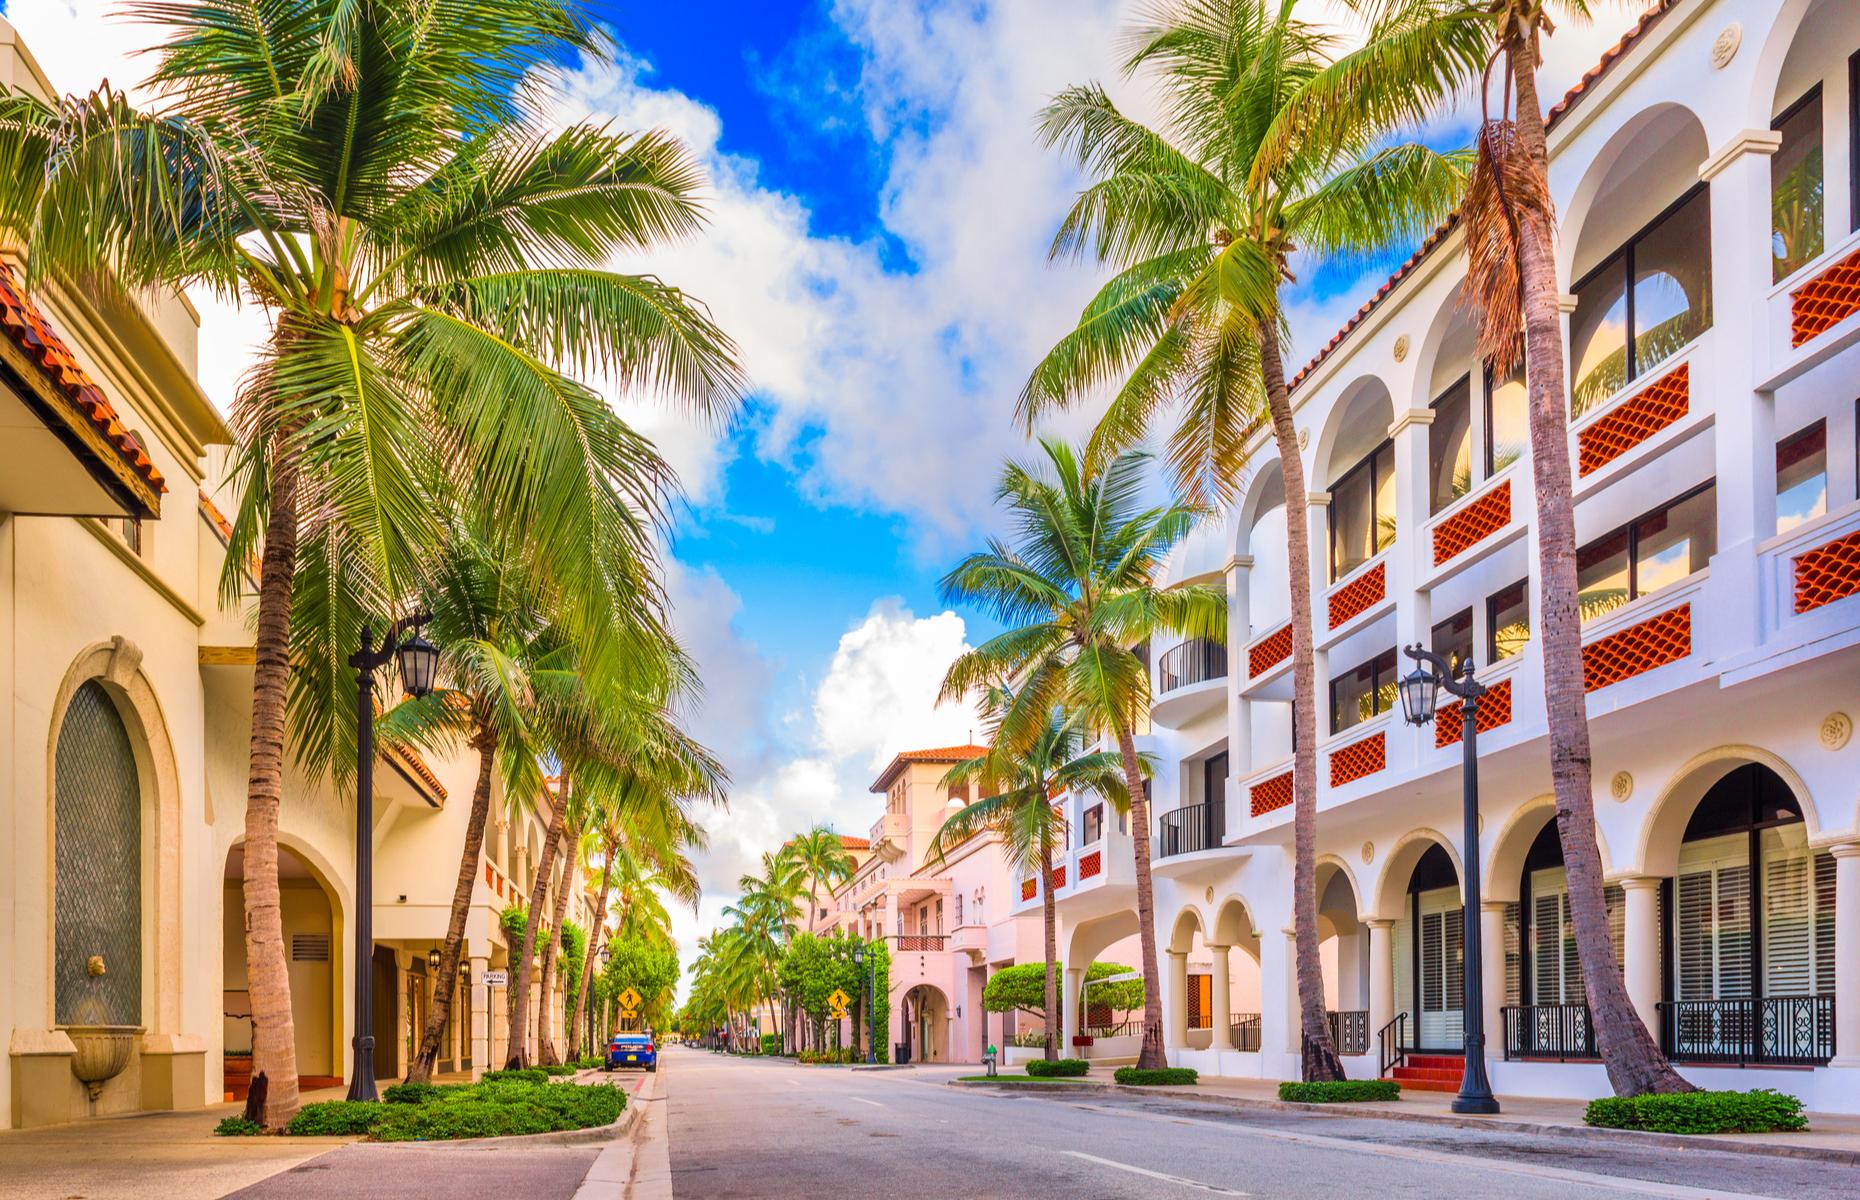 Worth Avenue in The Palm Beaches (Image: Sean Pavone/Shutterstock)